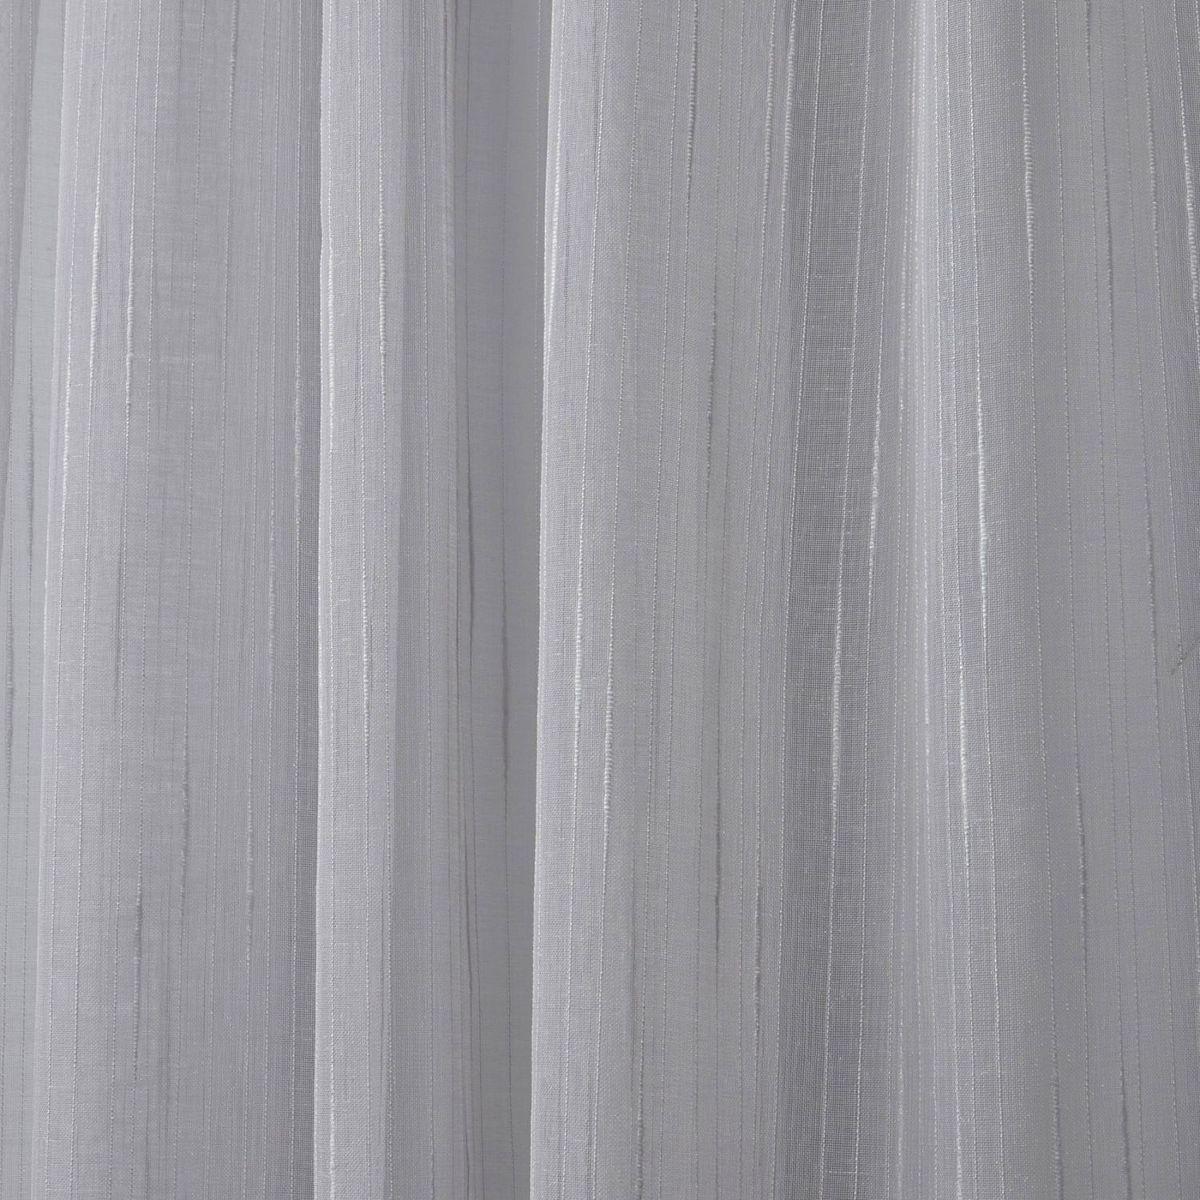 Nicole Miller 2-pack New York Wellington Embellished Slub Window Curtains Silver lVzME